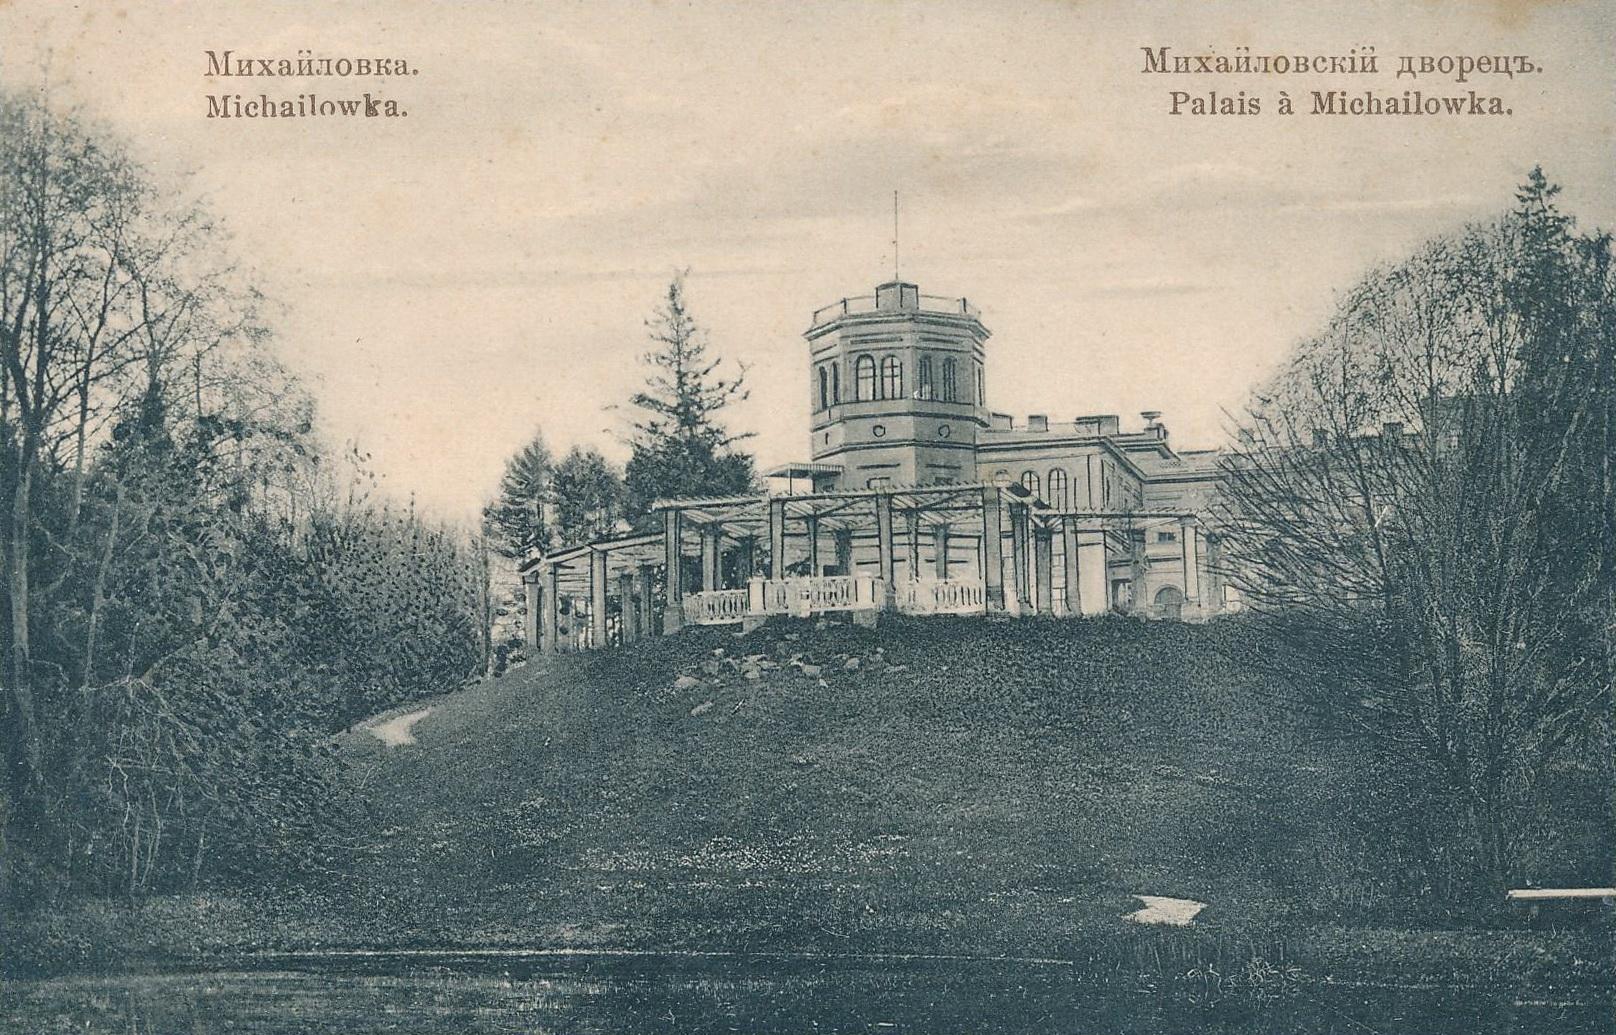 Вид на Михайловский дворец с Нижней дороги